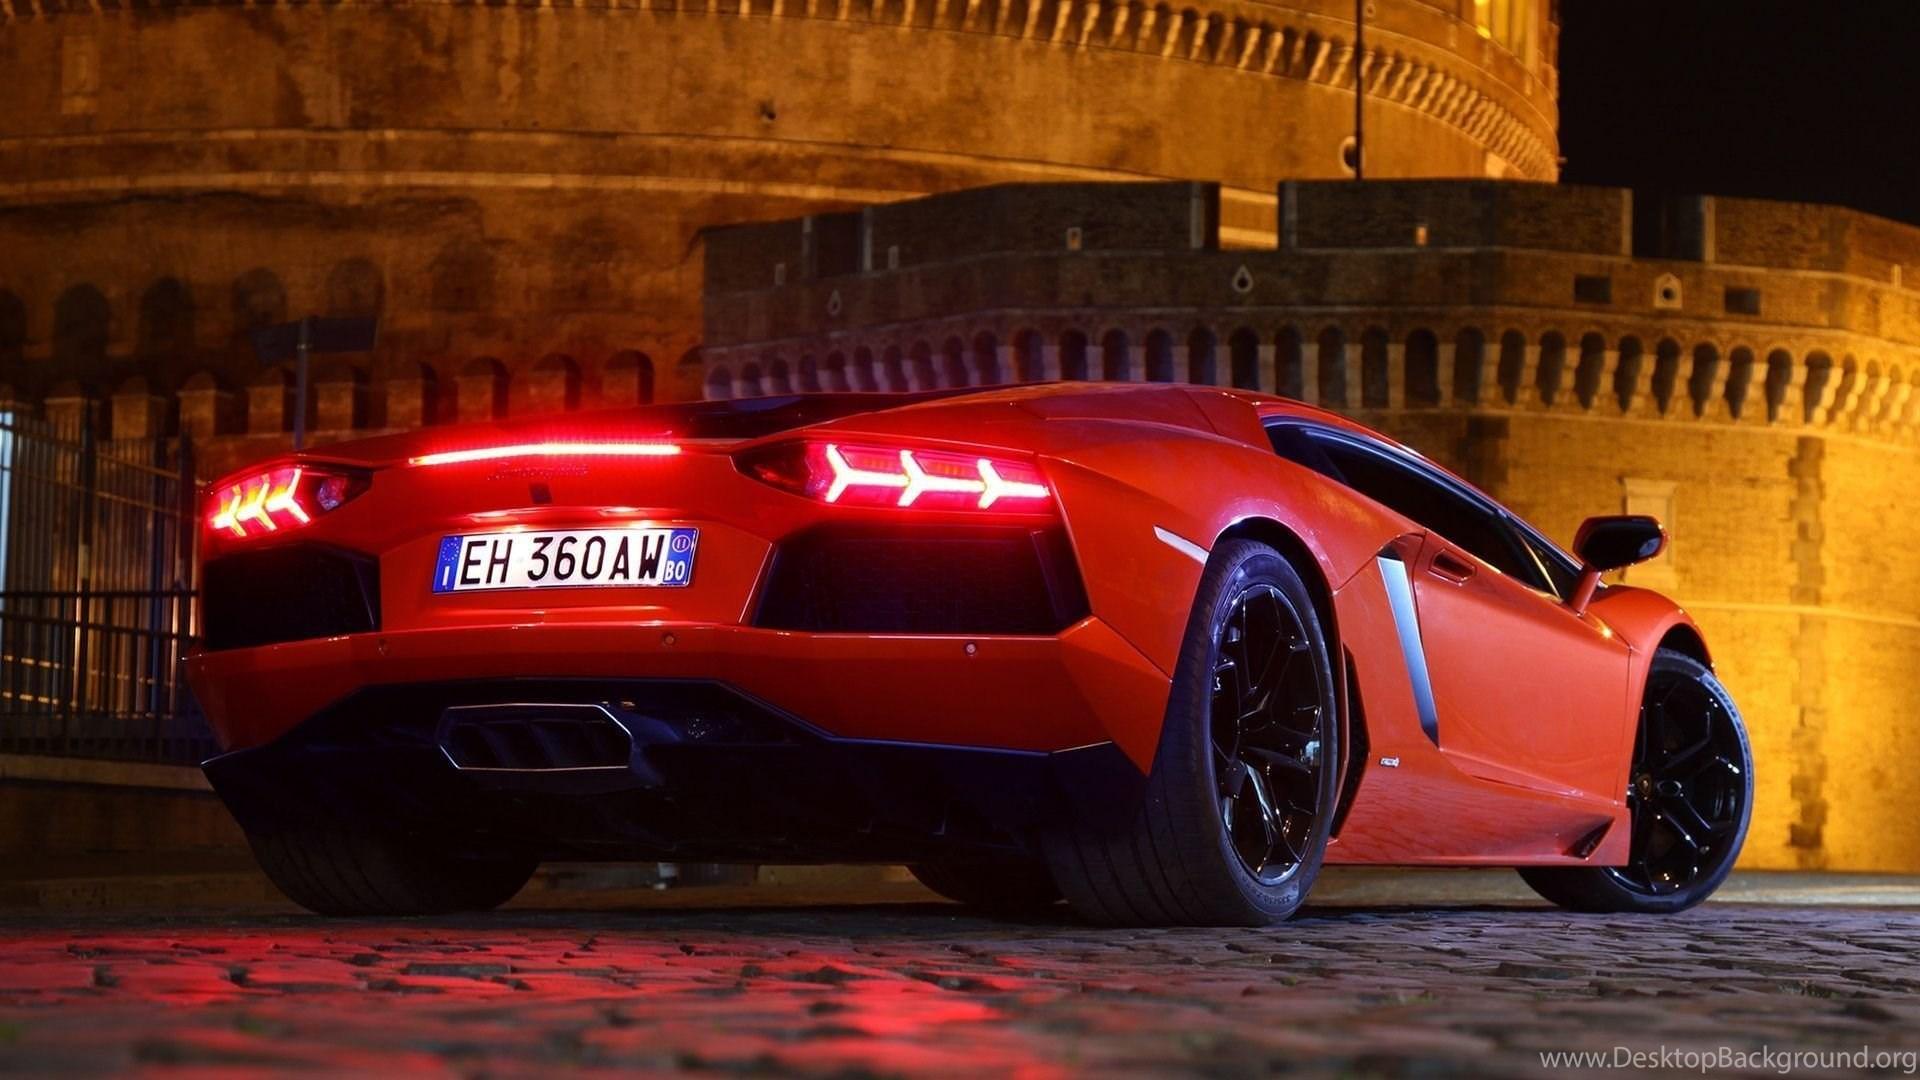 Lamborghini Sesto Elemento Wallpapers Image Desktop Background